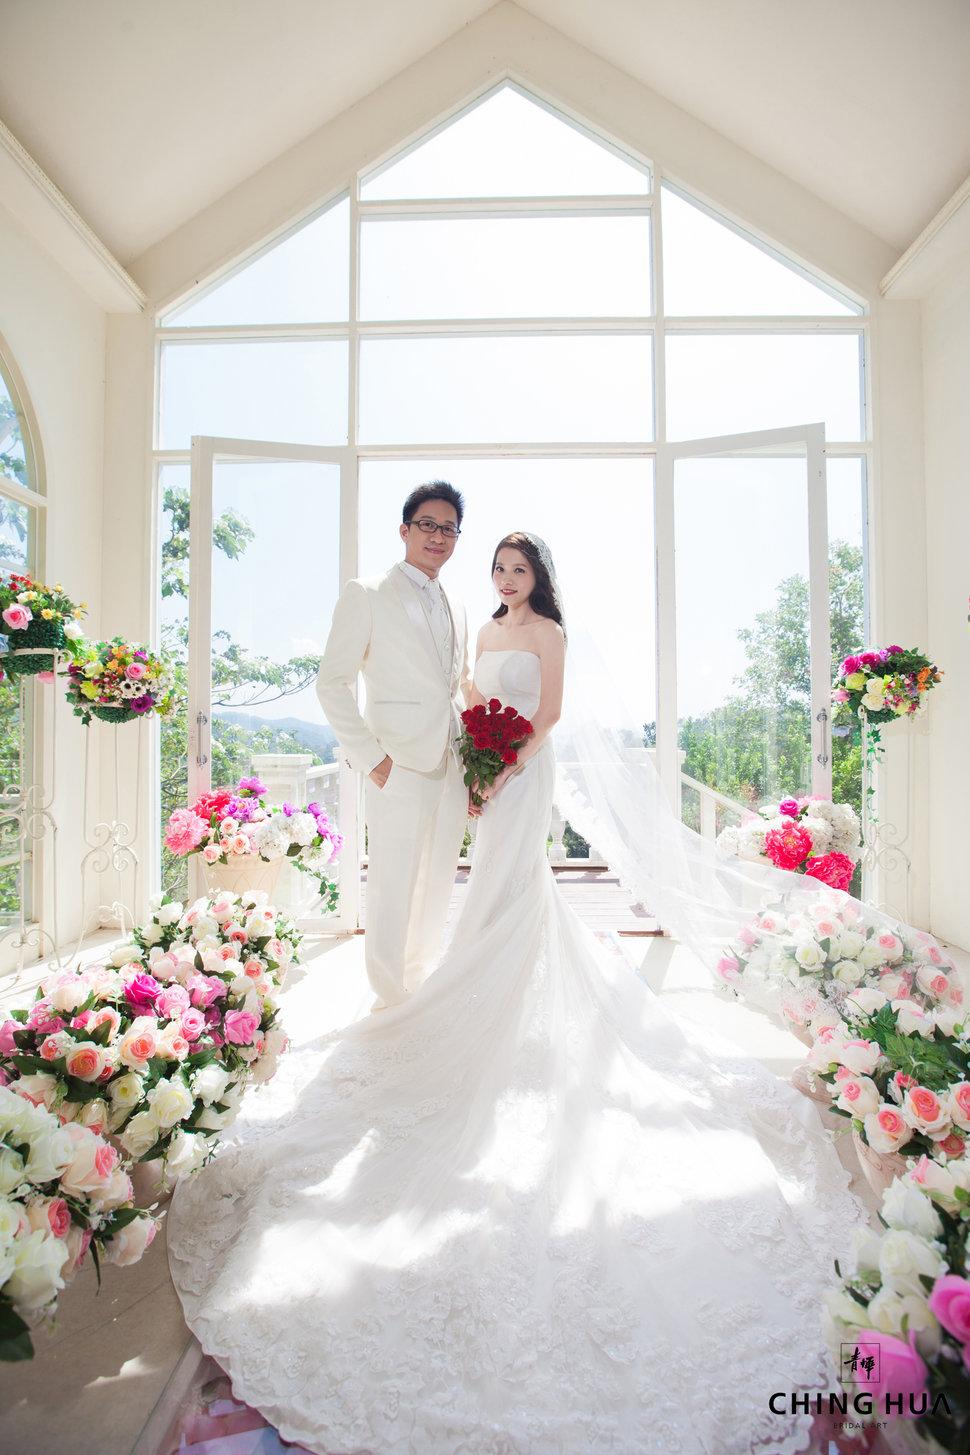 (編號:376880) - 青樺婚紗CHINGHUA - 結婚吧